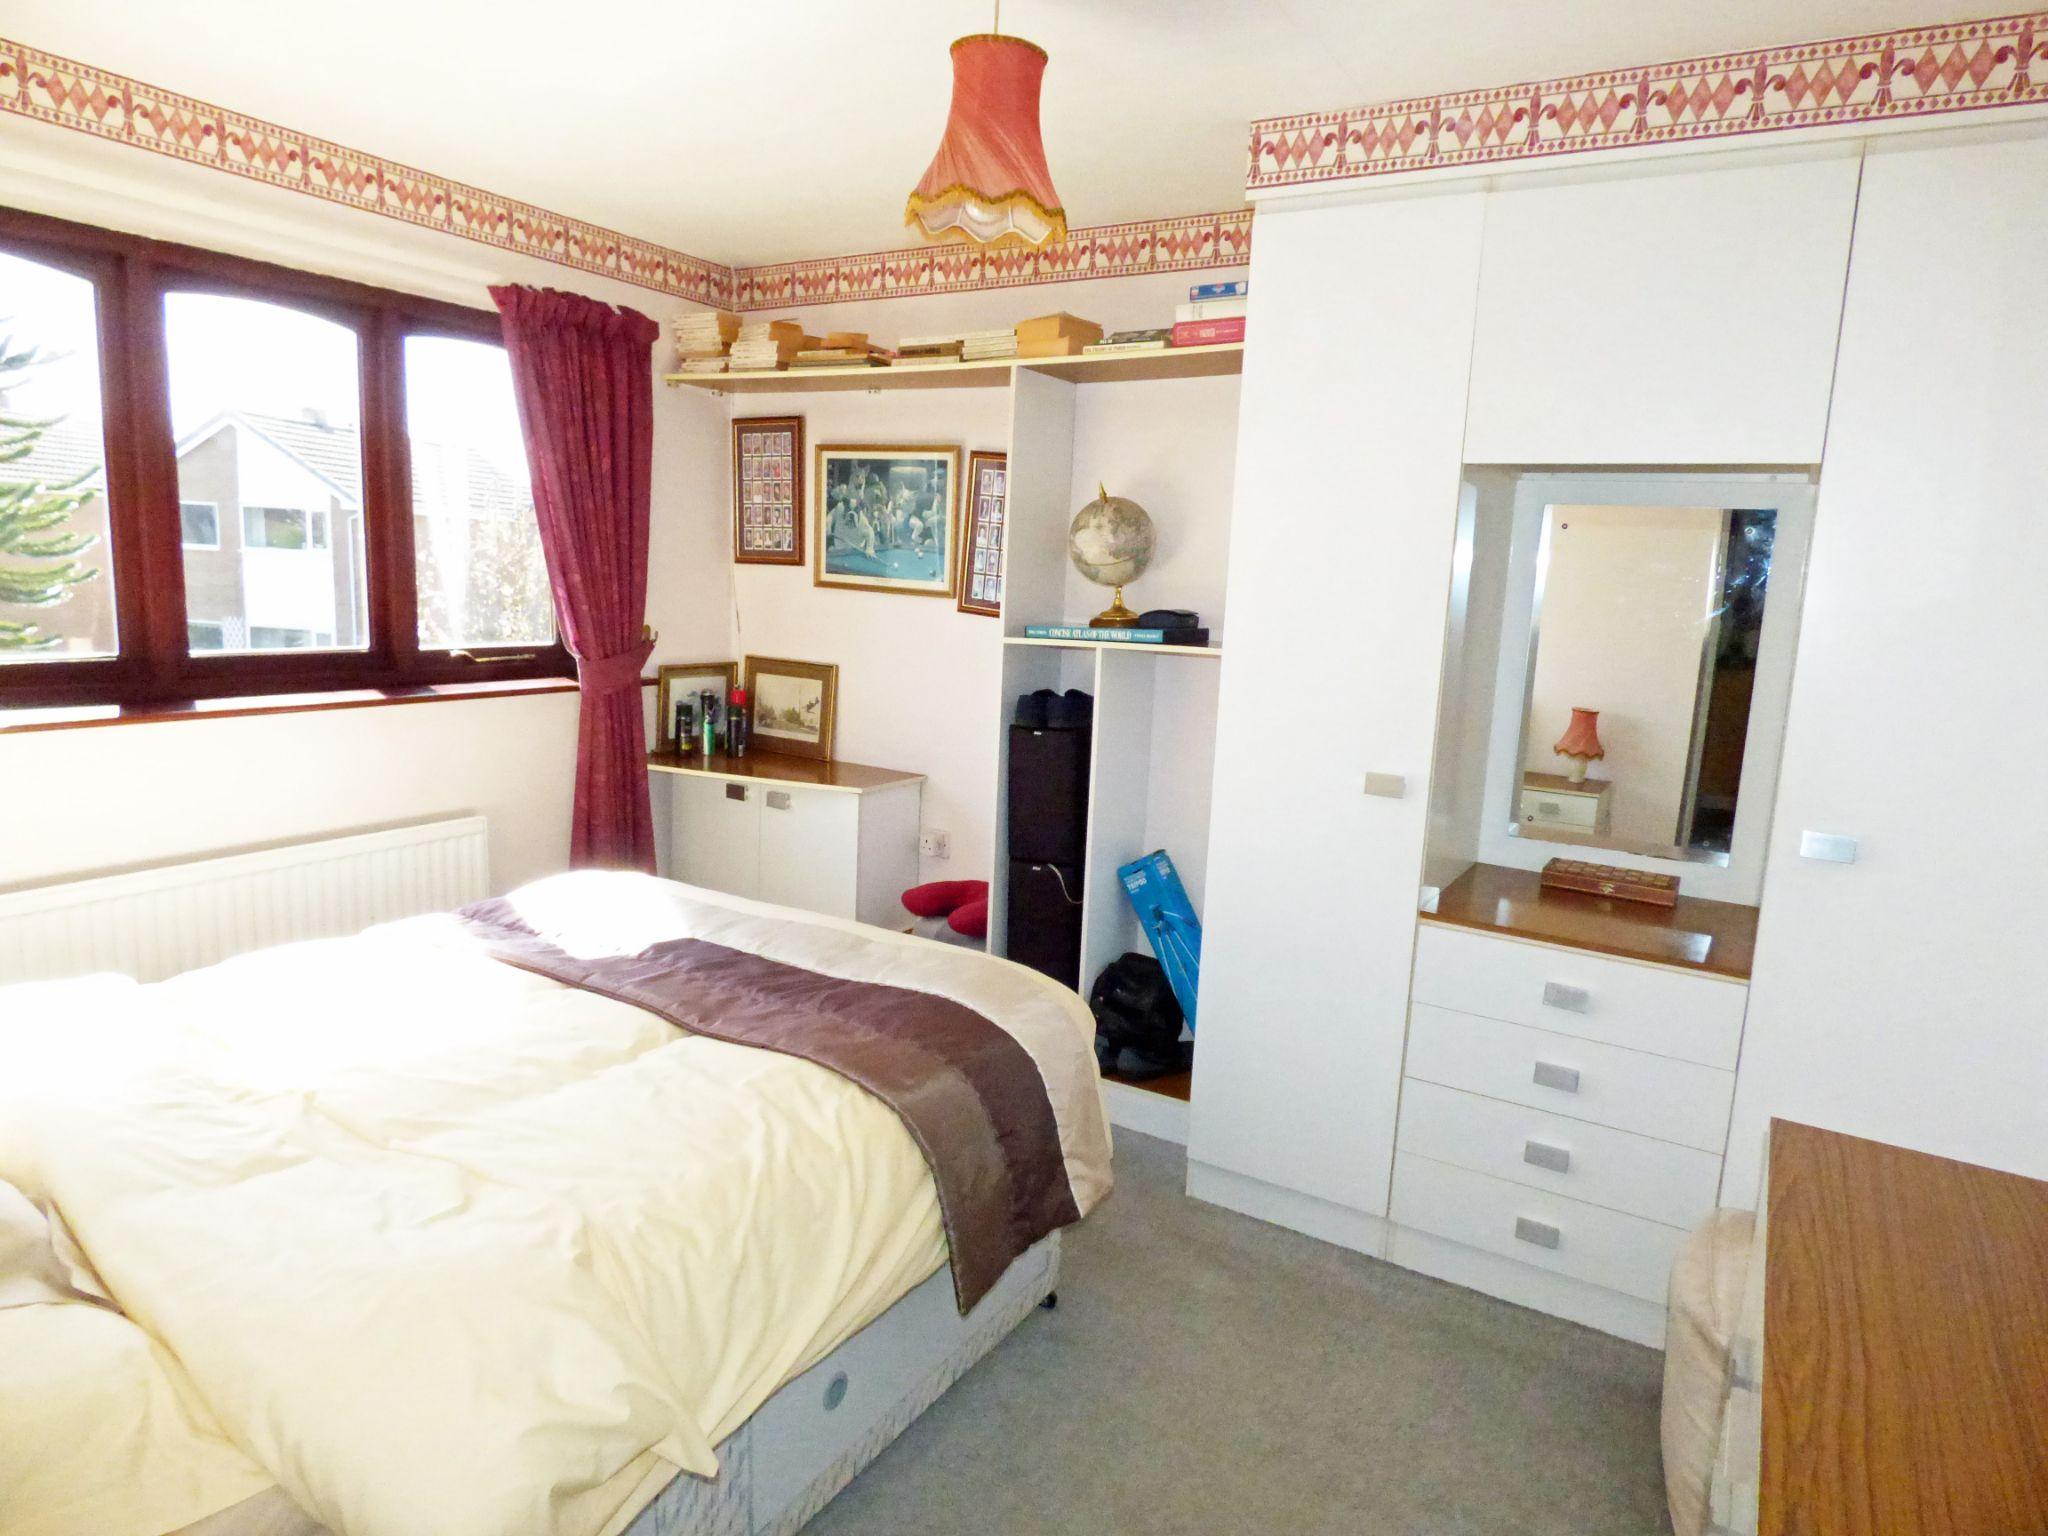 3 Bedroom Detached House For Sale - Bedroom 2